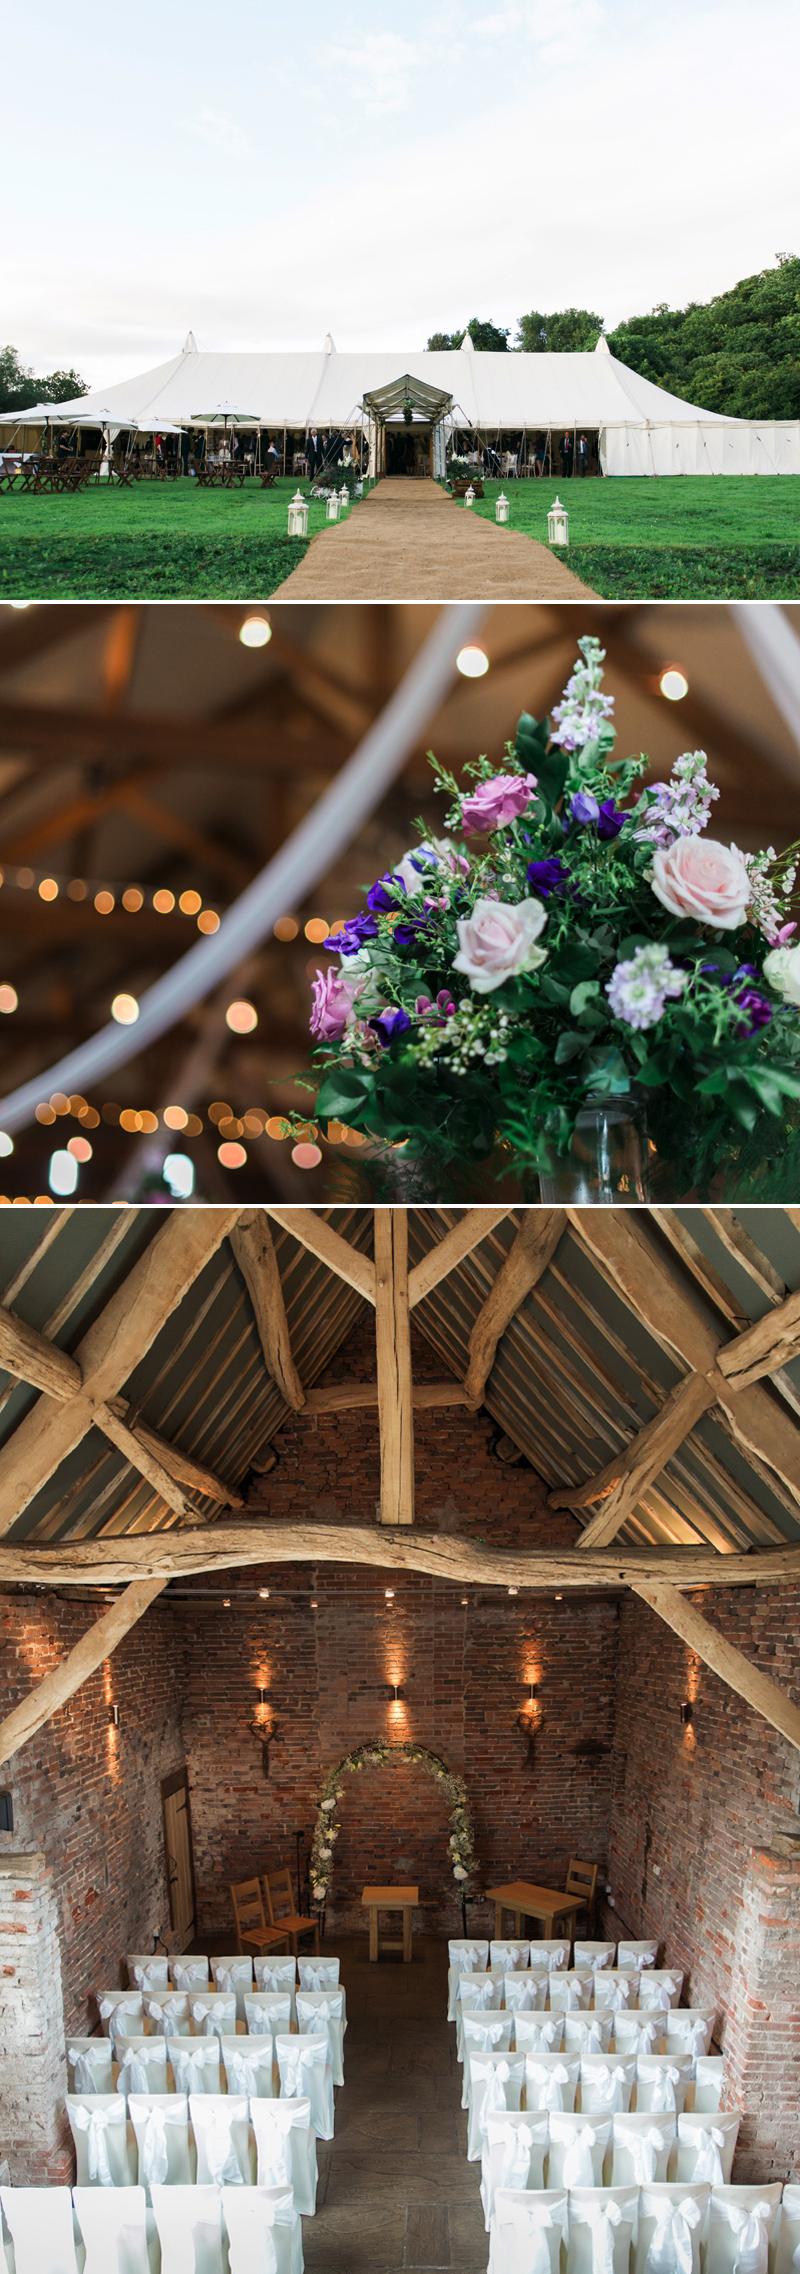 wedding-venue-photography-tips-theresa-furey-photography-coco-wedding-venues-001